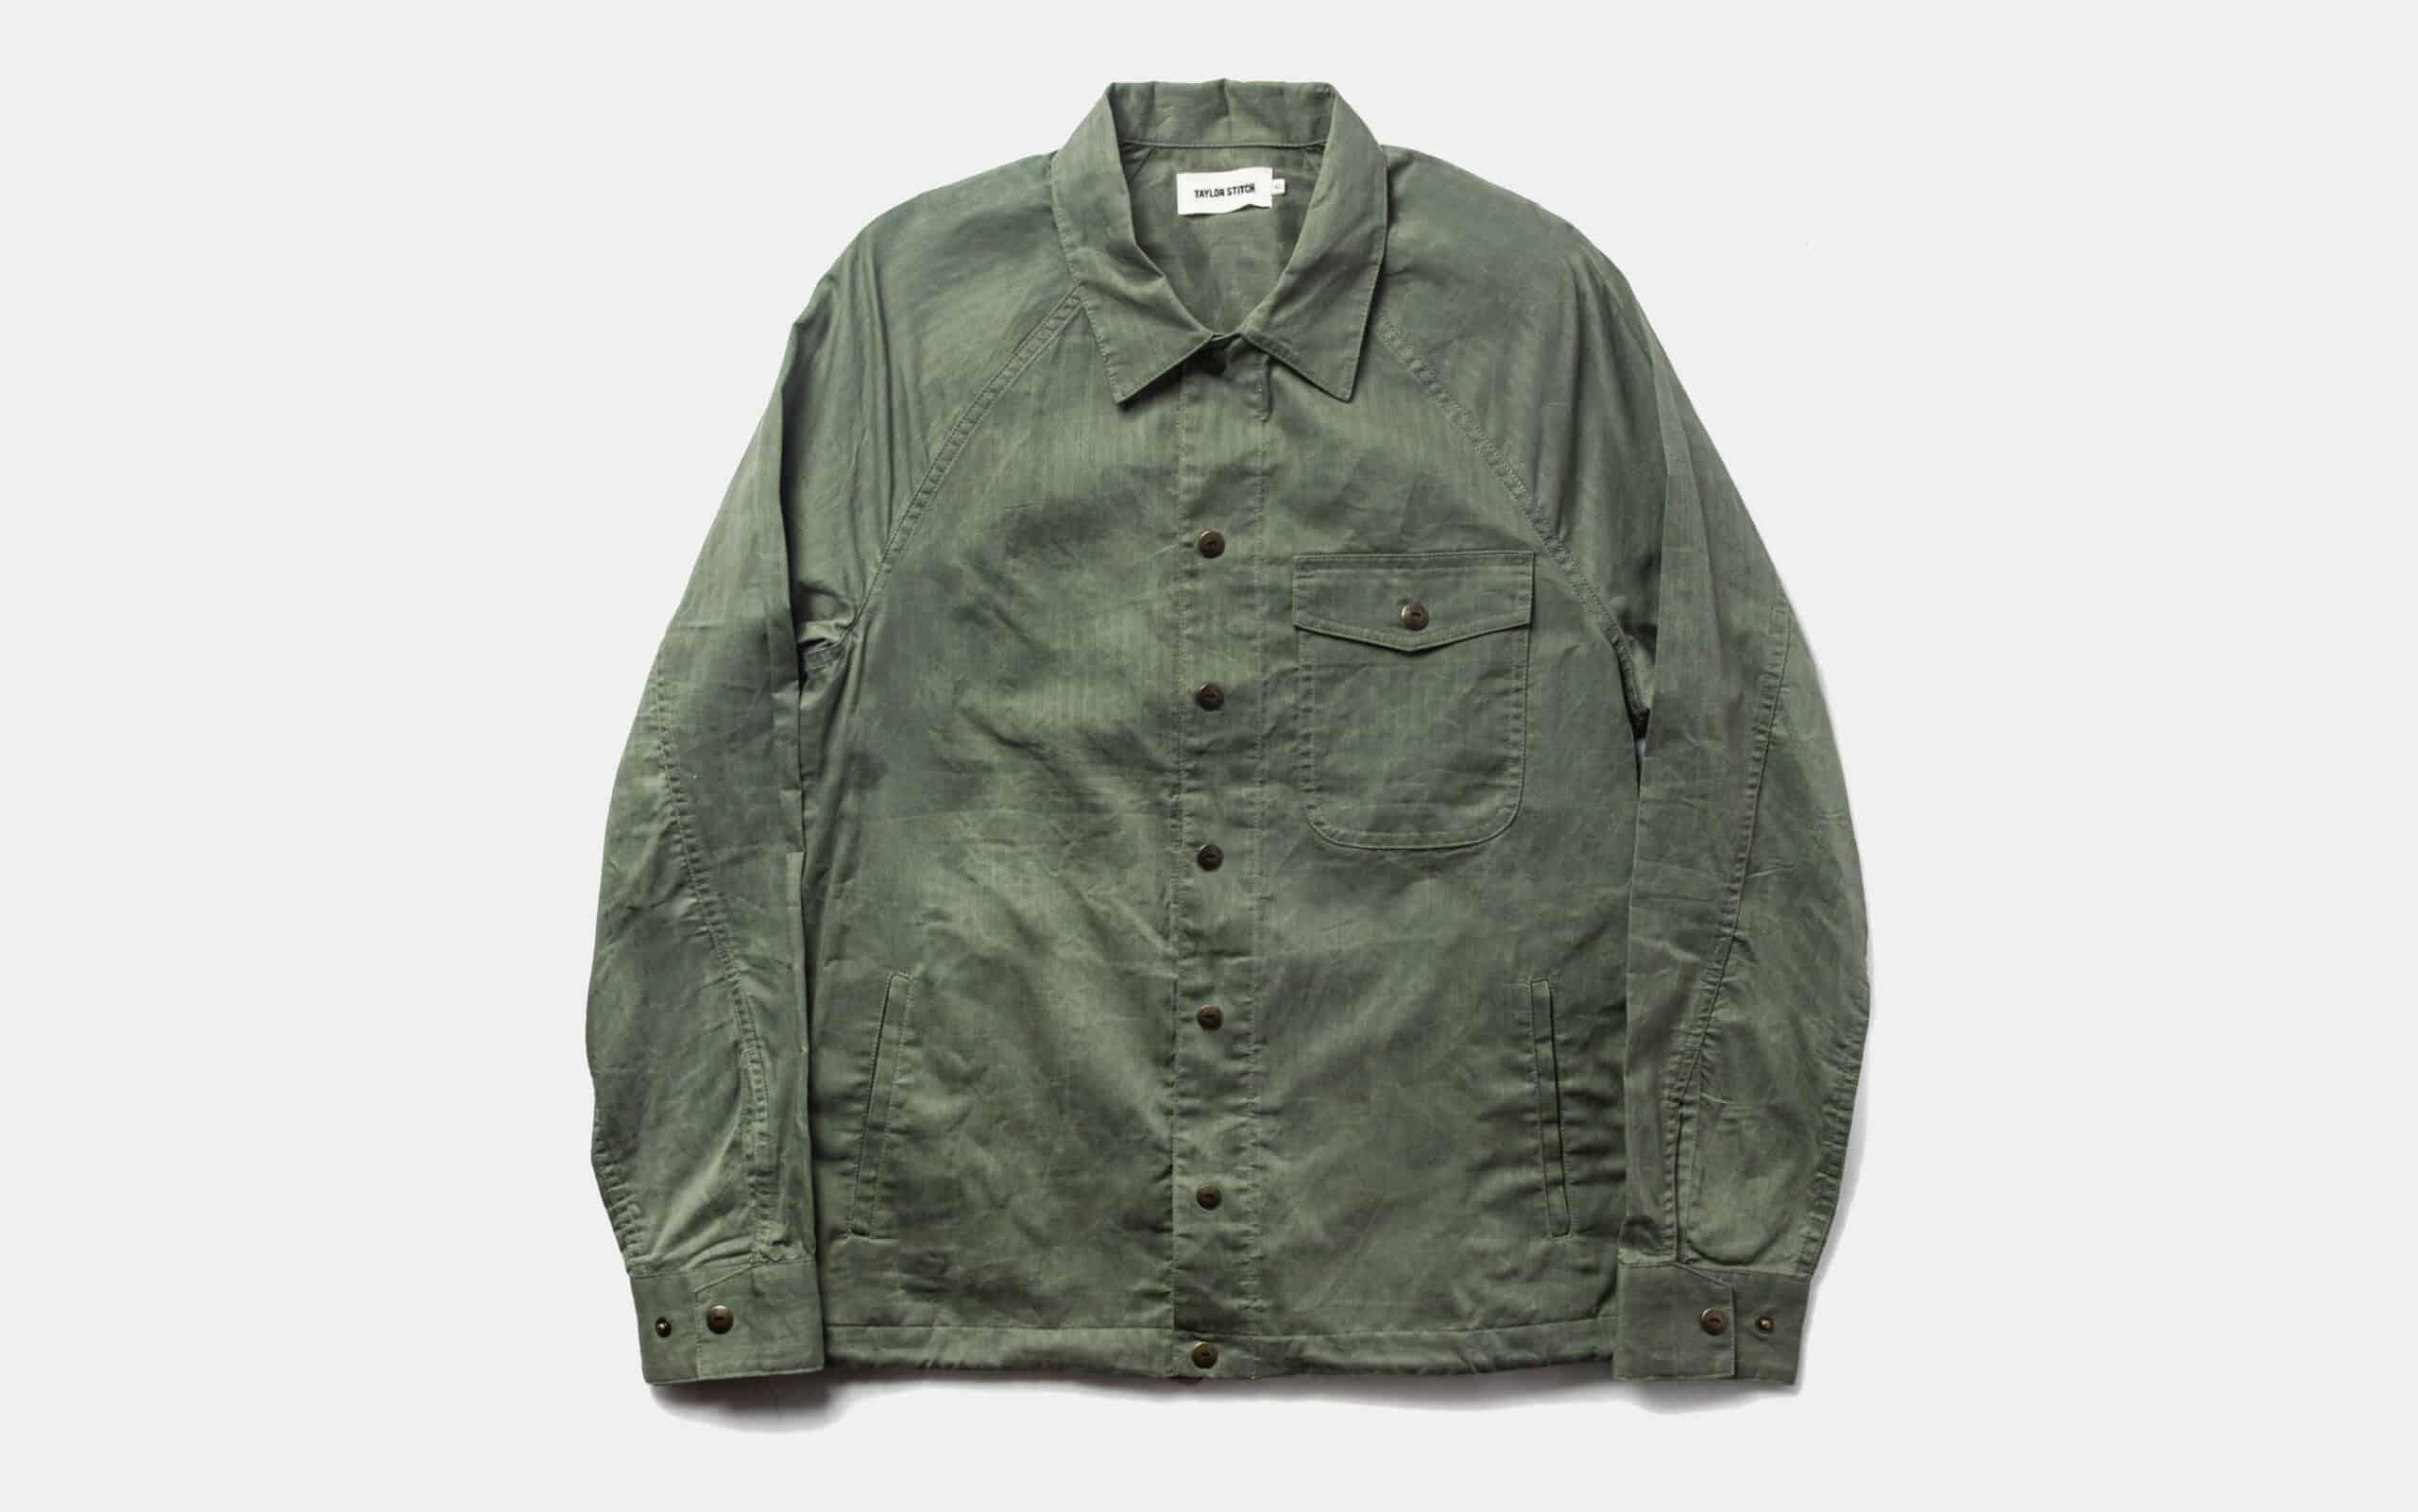 Taylor Stitch Lombardi Jacket in Olive Dry Wax